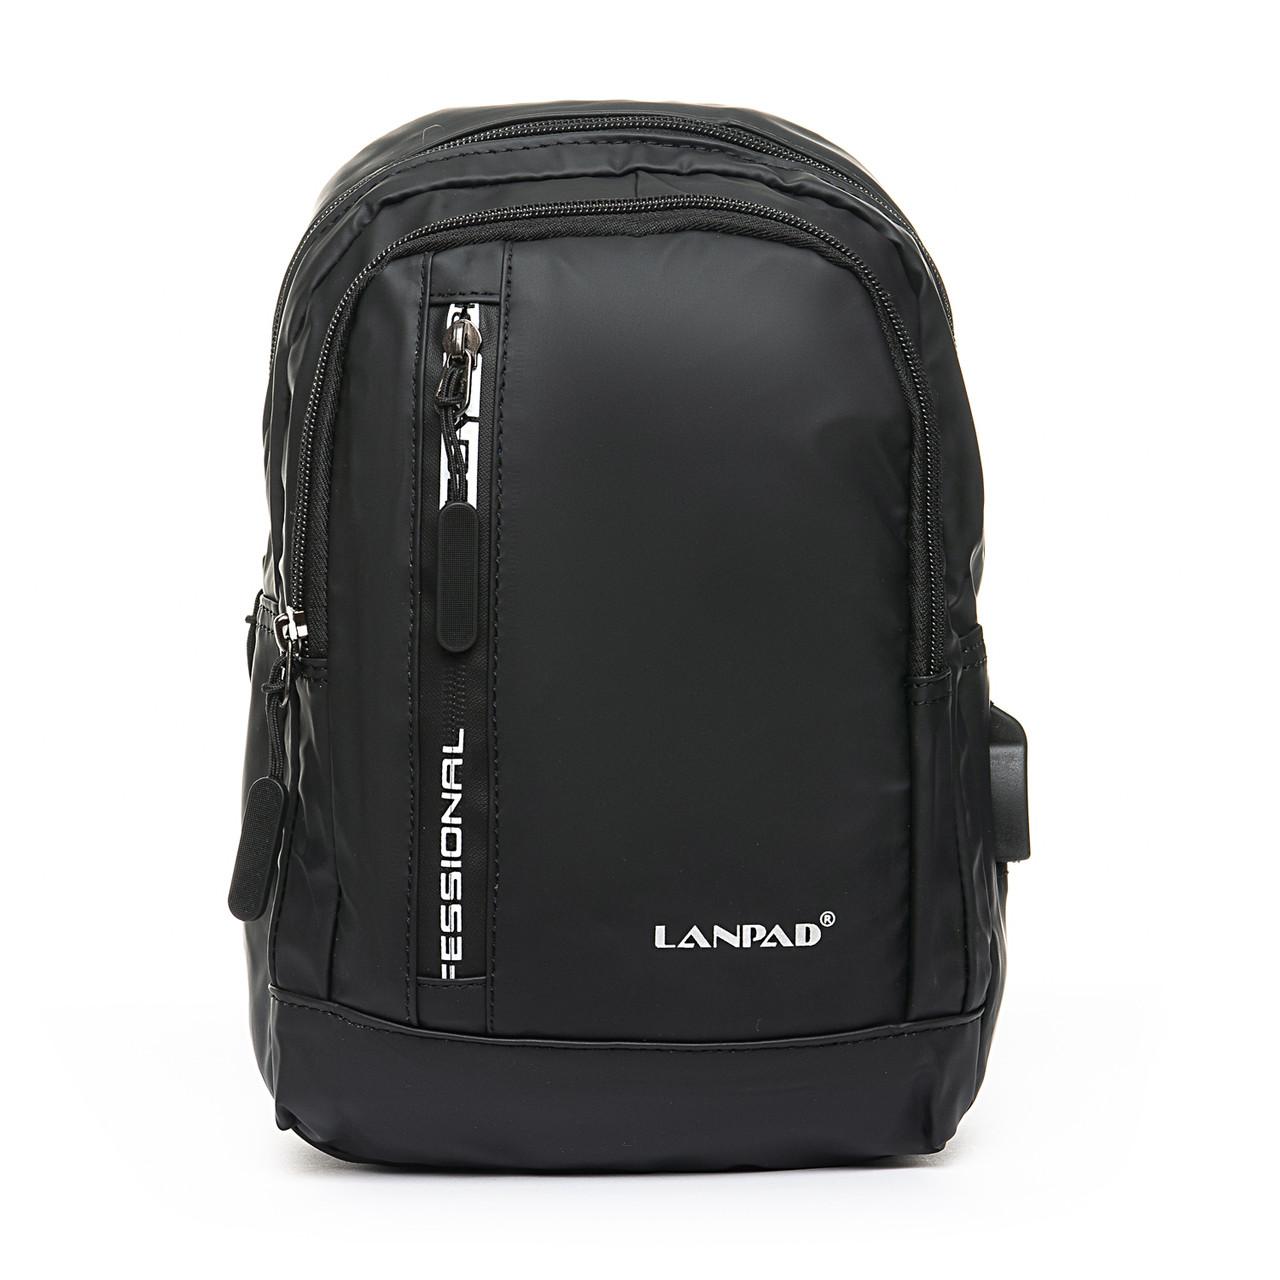 Мужская сумка через плече Lanpad 18 x 28 x 10 см Черный (8329/1)